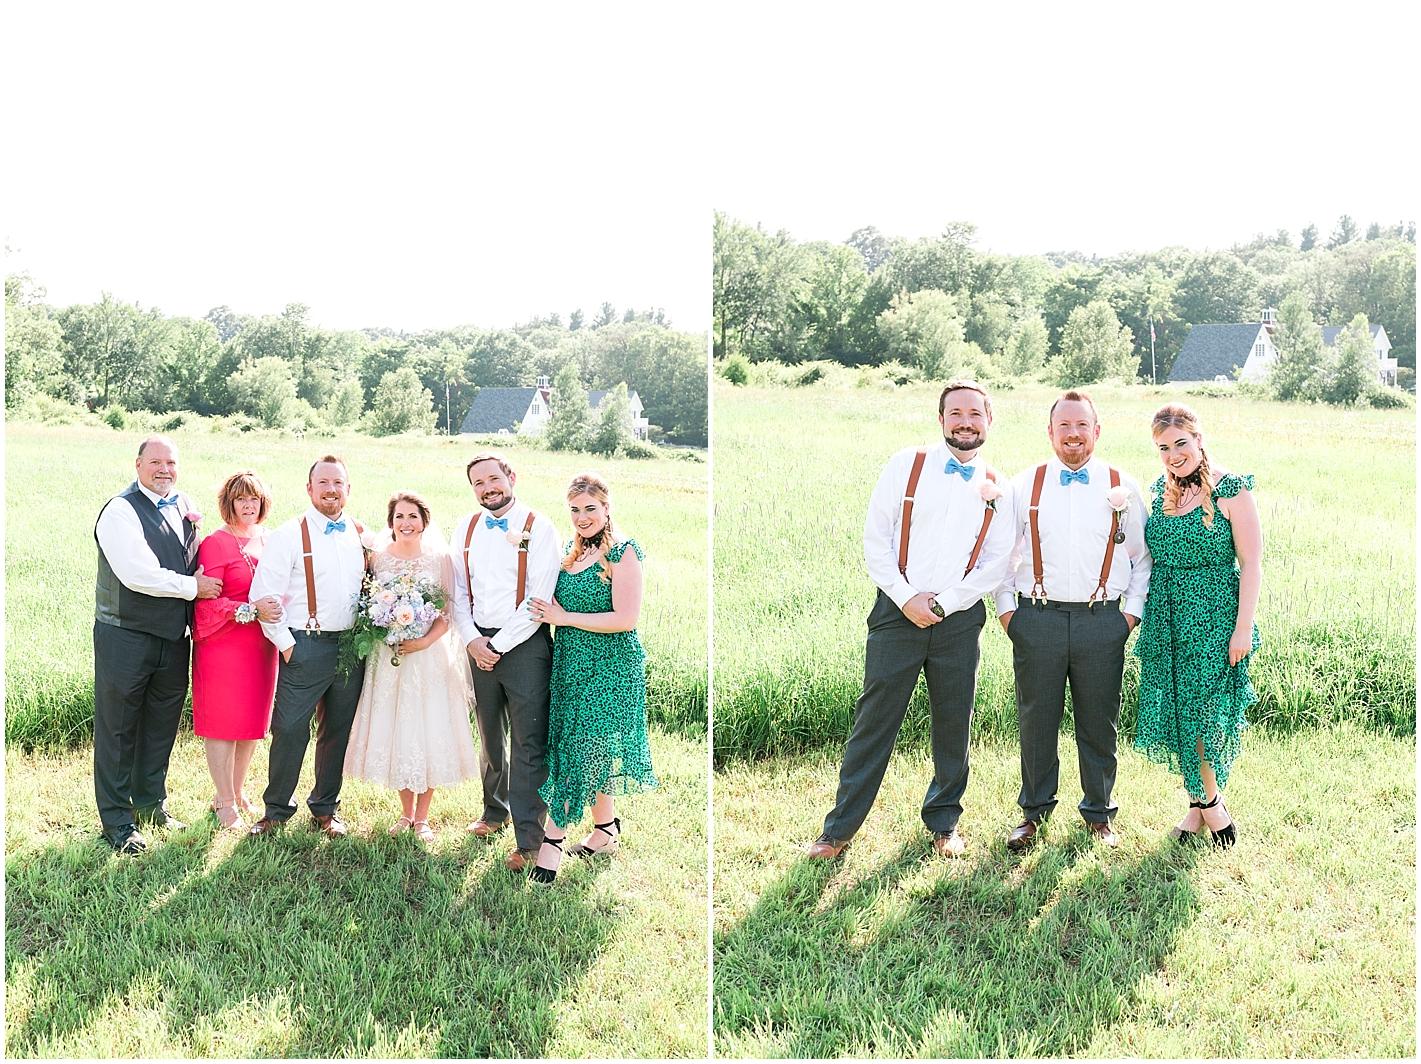 Family Wedding Photos by Alyssa Parker Photography